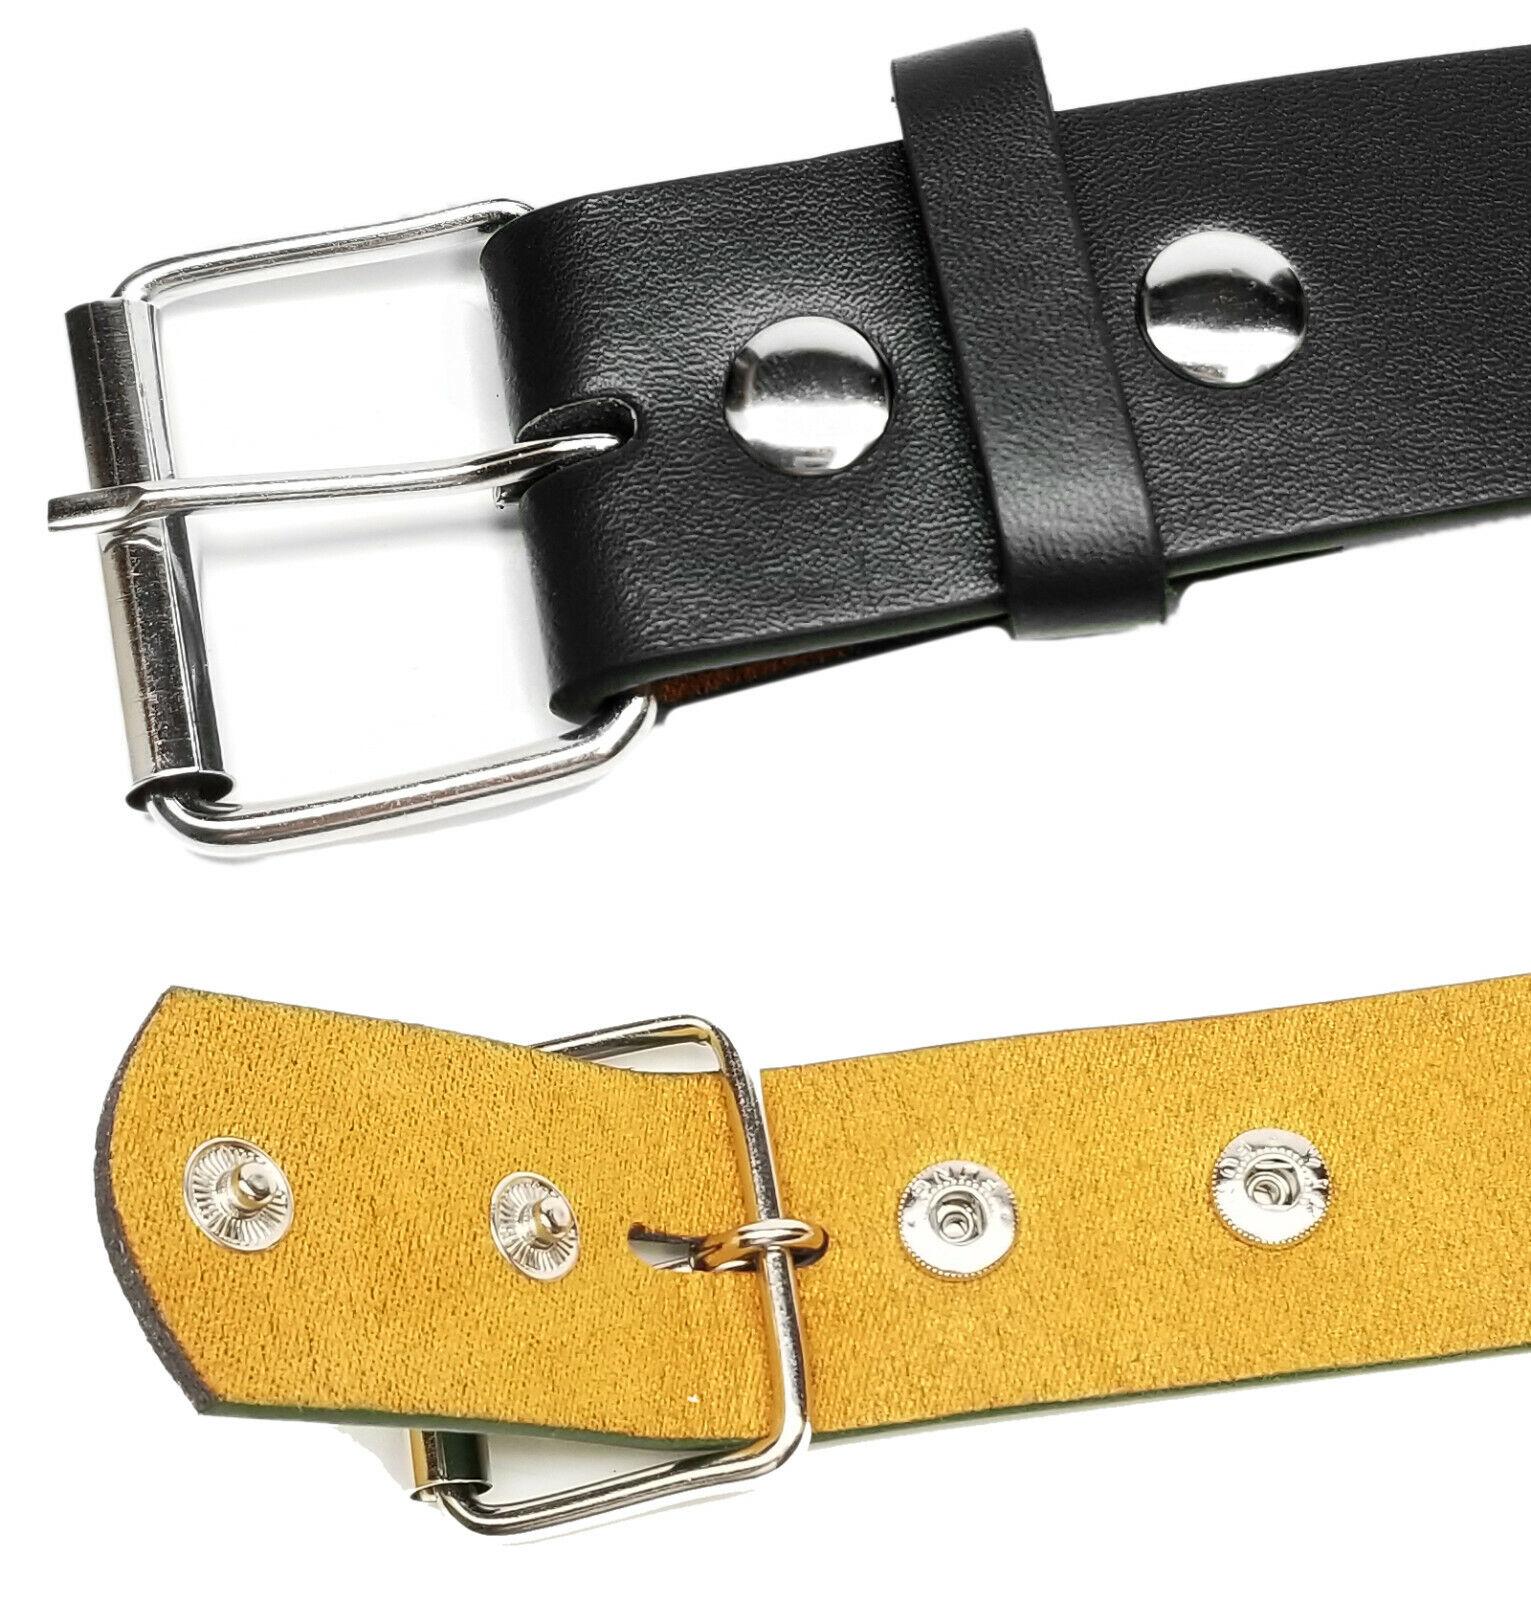 New Bonded Leather Belt Multi Color Golf Baseball Softball Removable Belt Buckle Belts